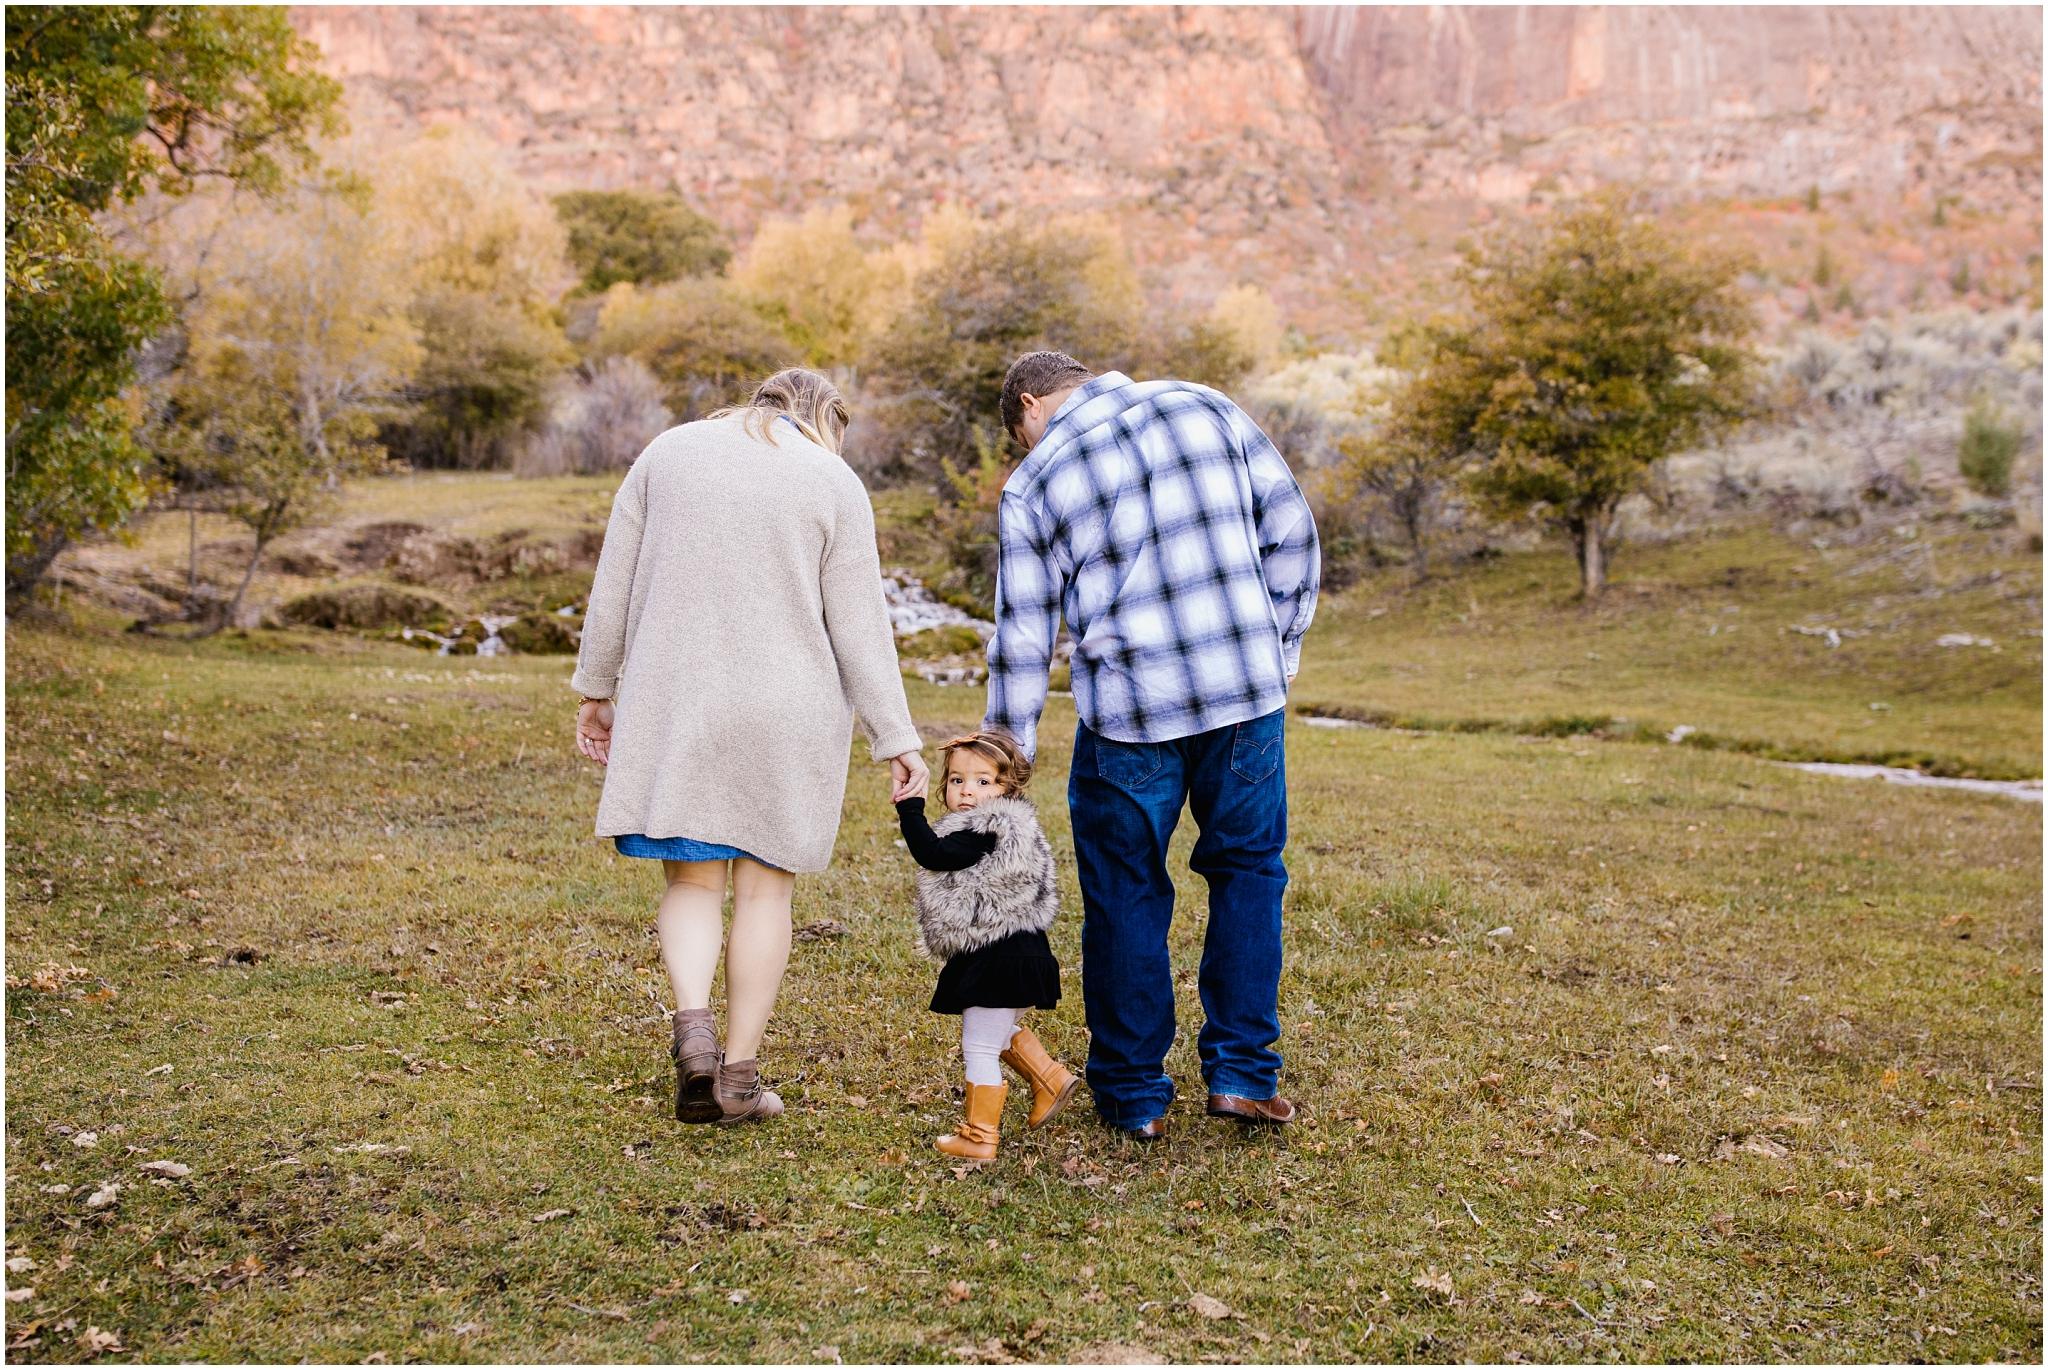 Frandsen-11_Lizzie-B-Imagery-Utah-Family-Photographer-Utah-County-Central-Utah-Park-City-Salt-Lake-City.jpg